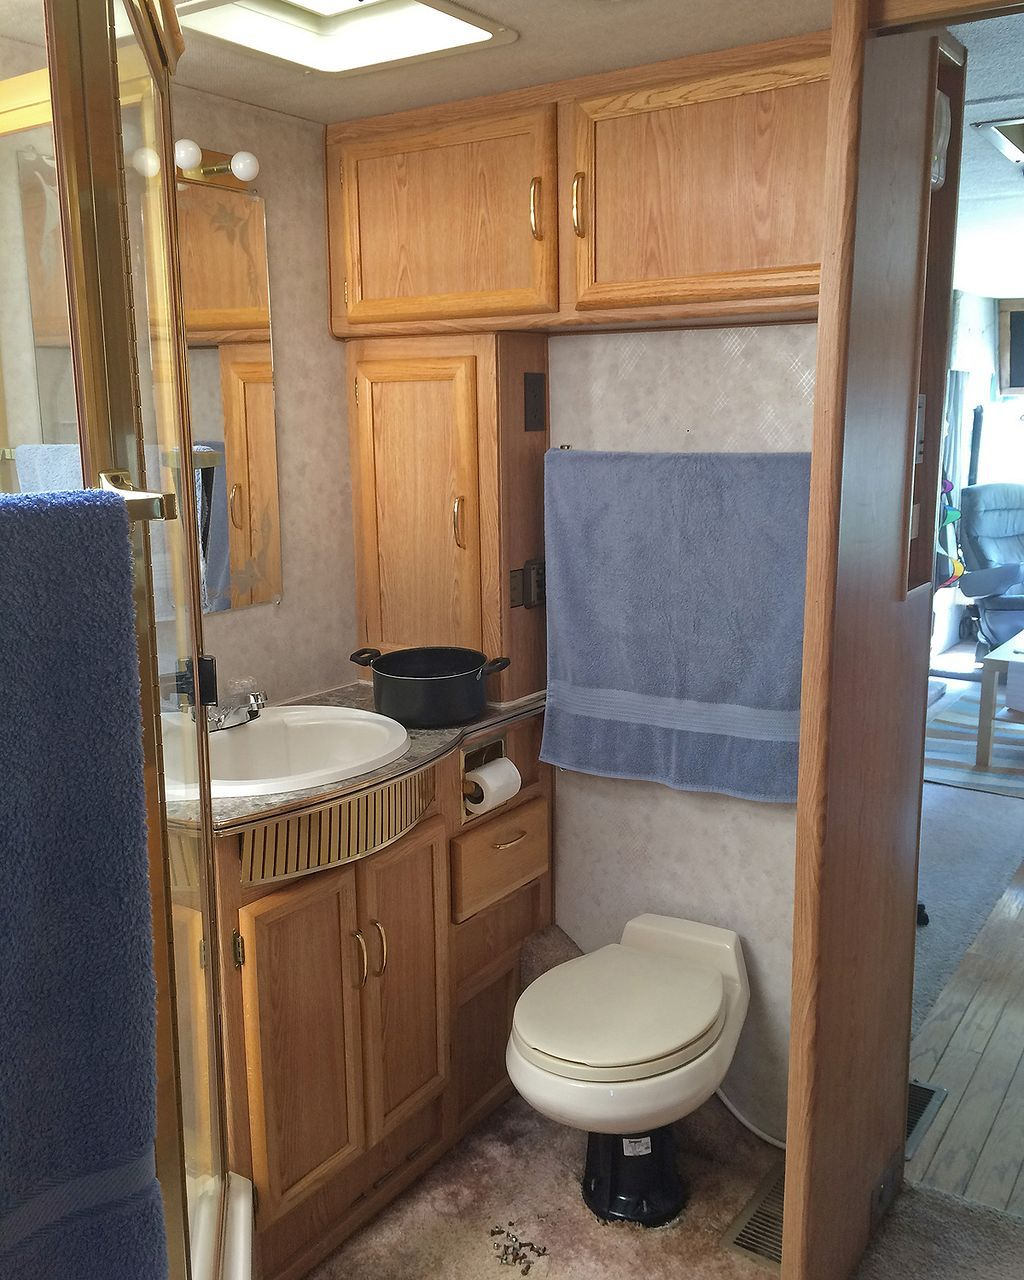 Best RV Bathroom Remodel Ideas Pinterest Rv Bathroom And Rv - Rv bathroom remodel